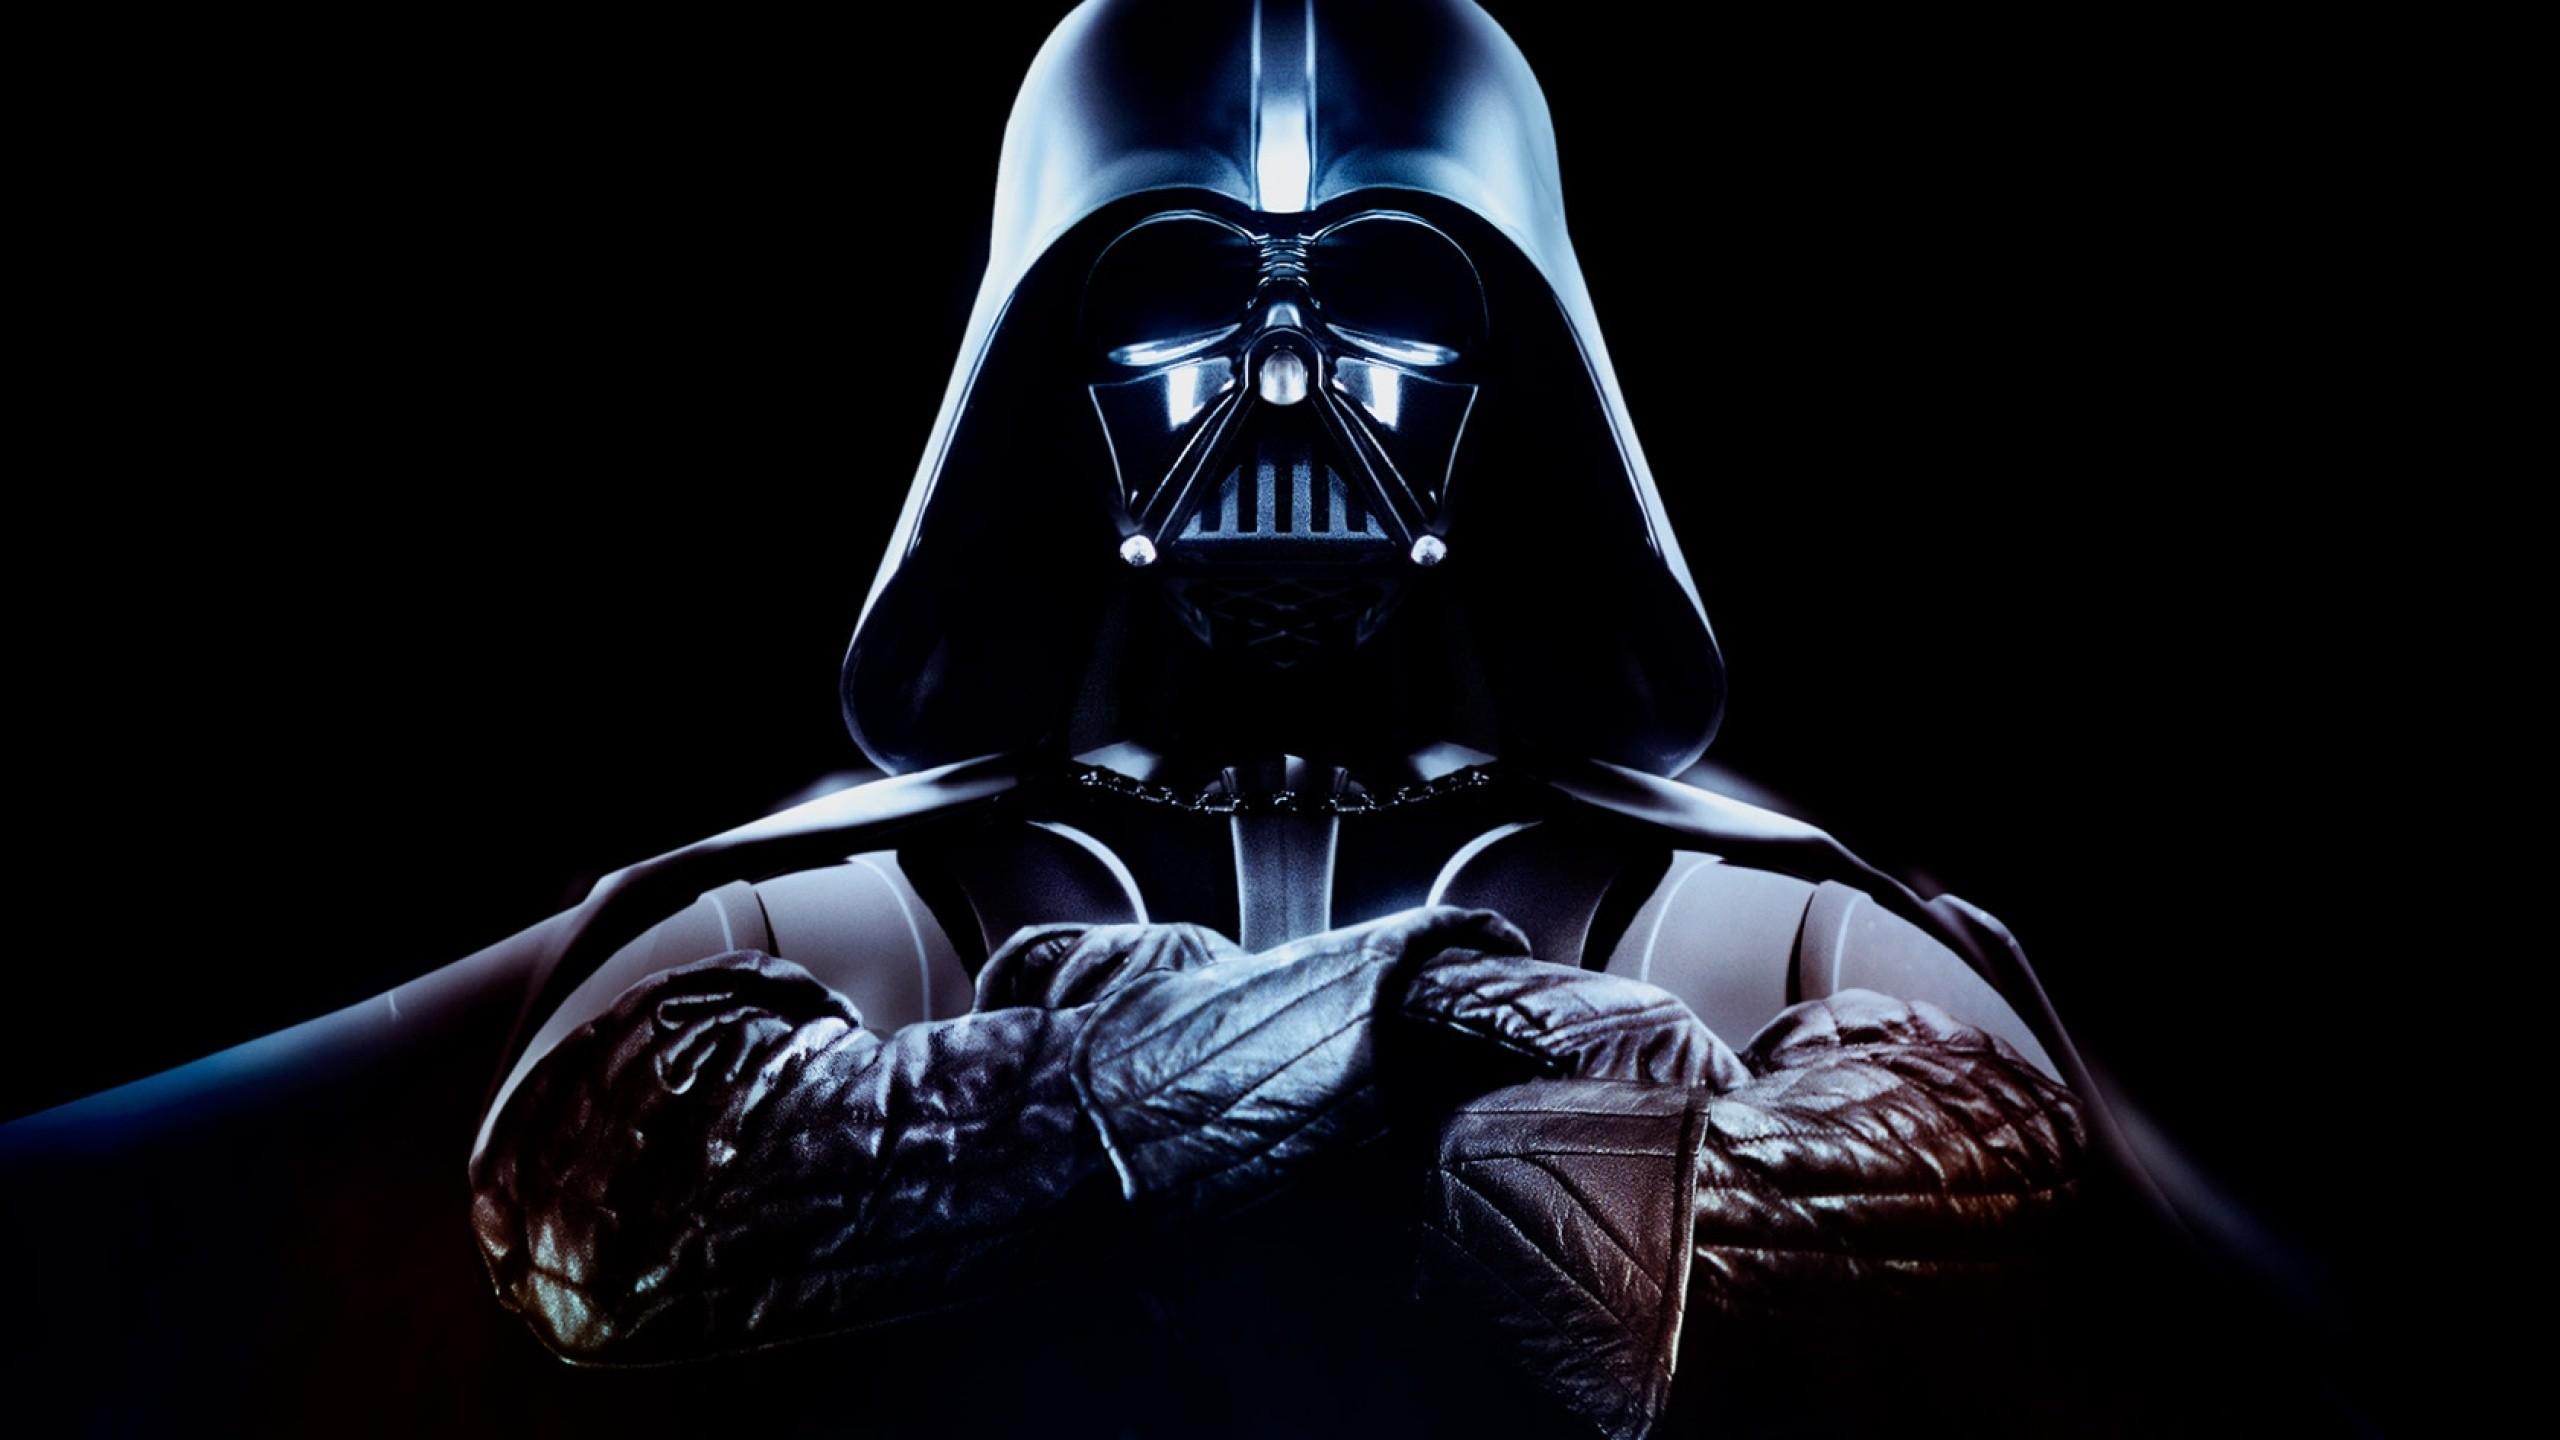 Star-Wars-Starwars-Darth-Vader-Lord-Vader-Darth-